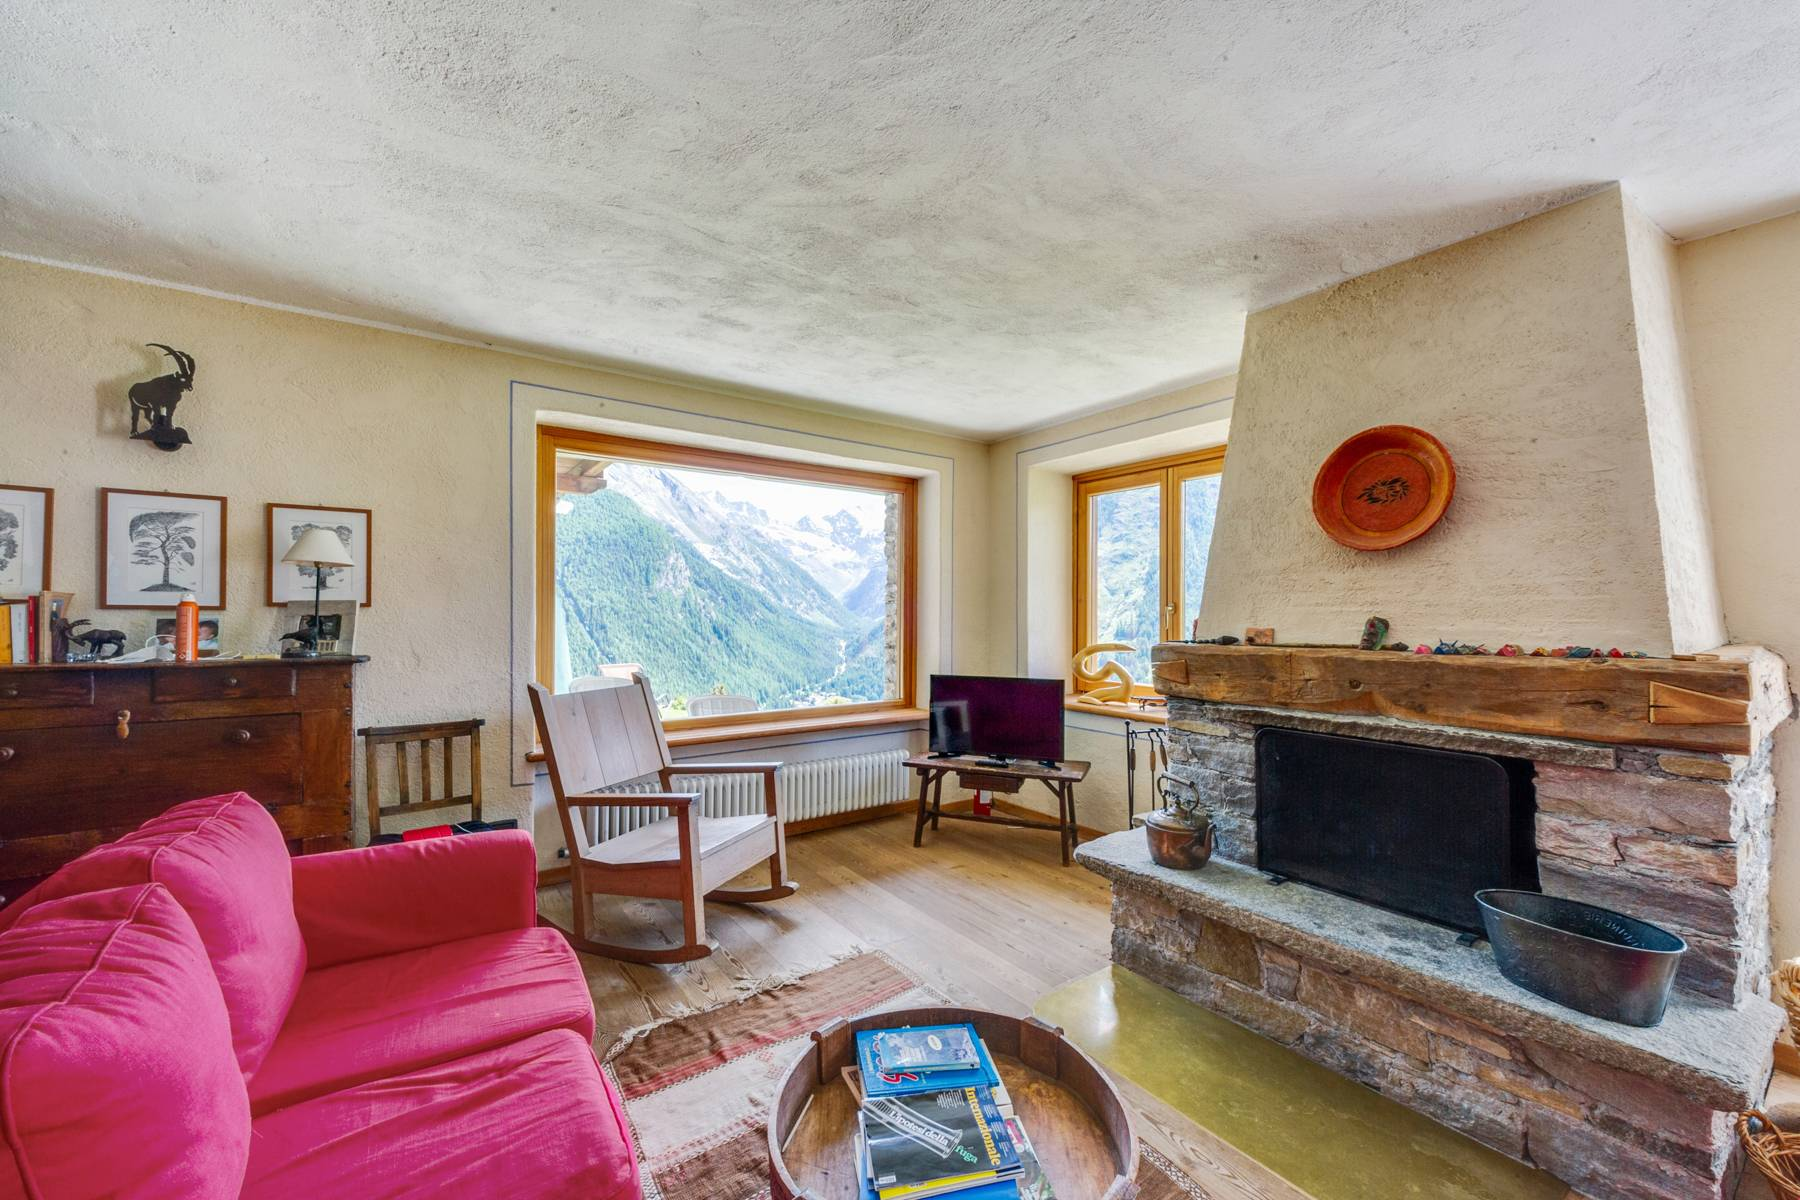 Villa in Vendita a Cogne: 5 locali, 377 mq - Foto 24